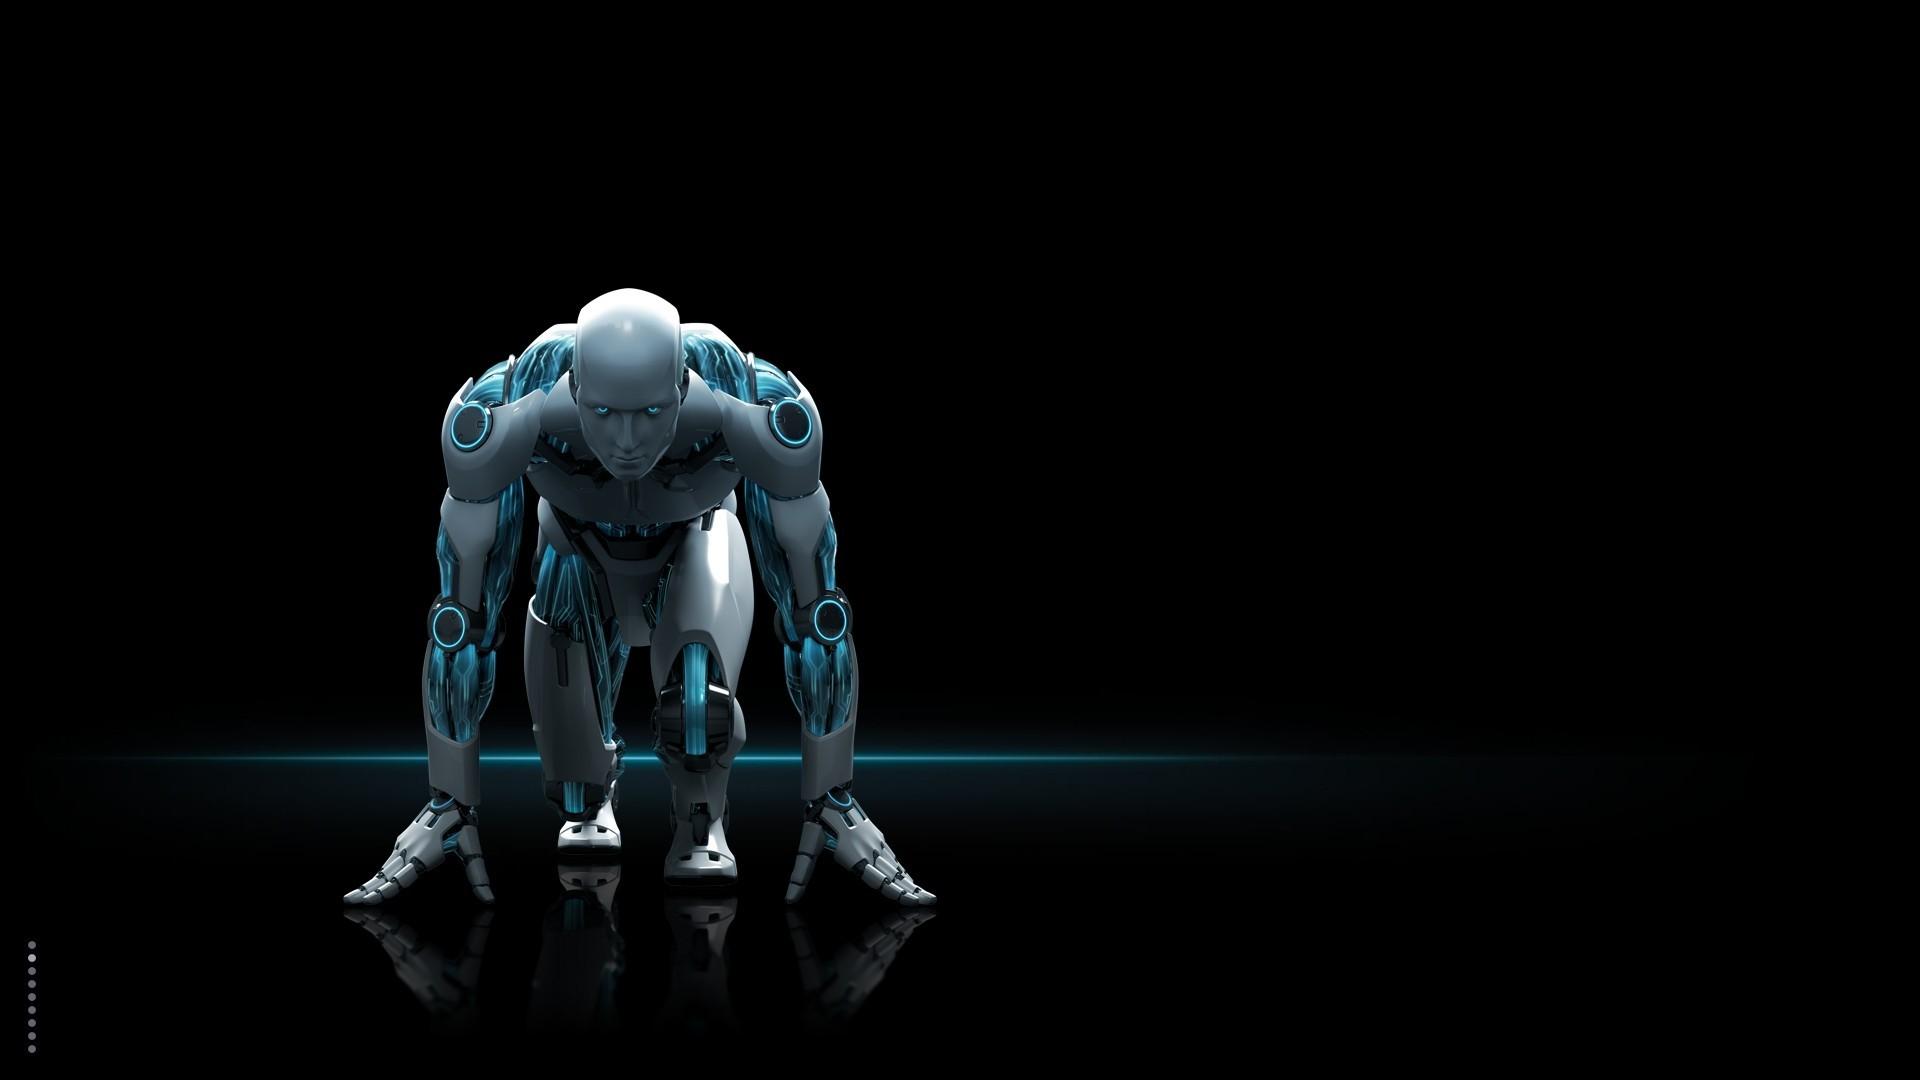 robot, androids, digital art, cgi, science fiction, black